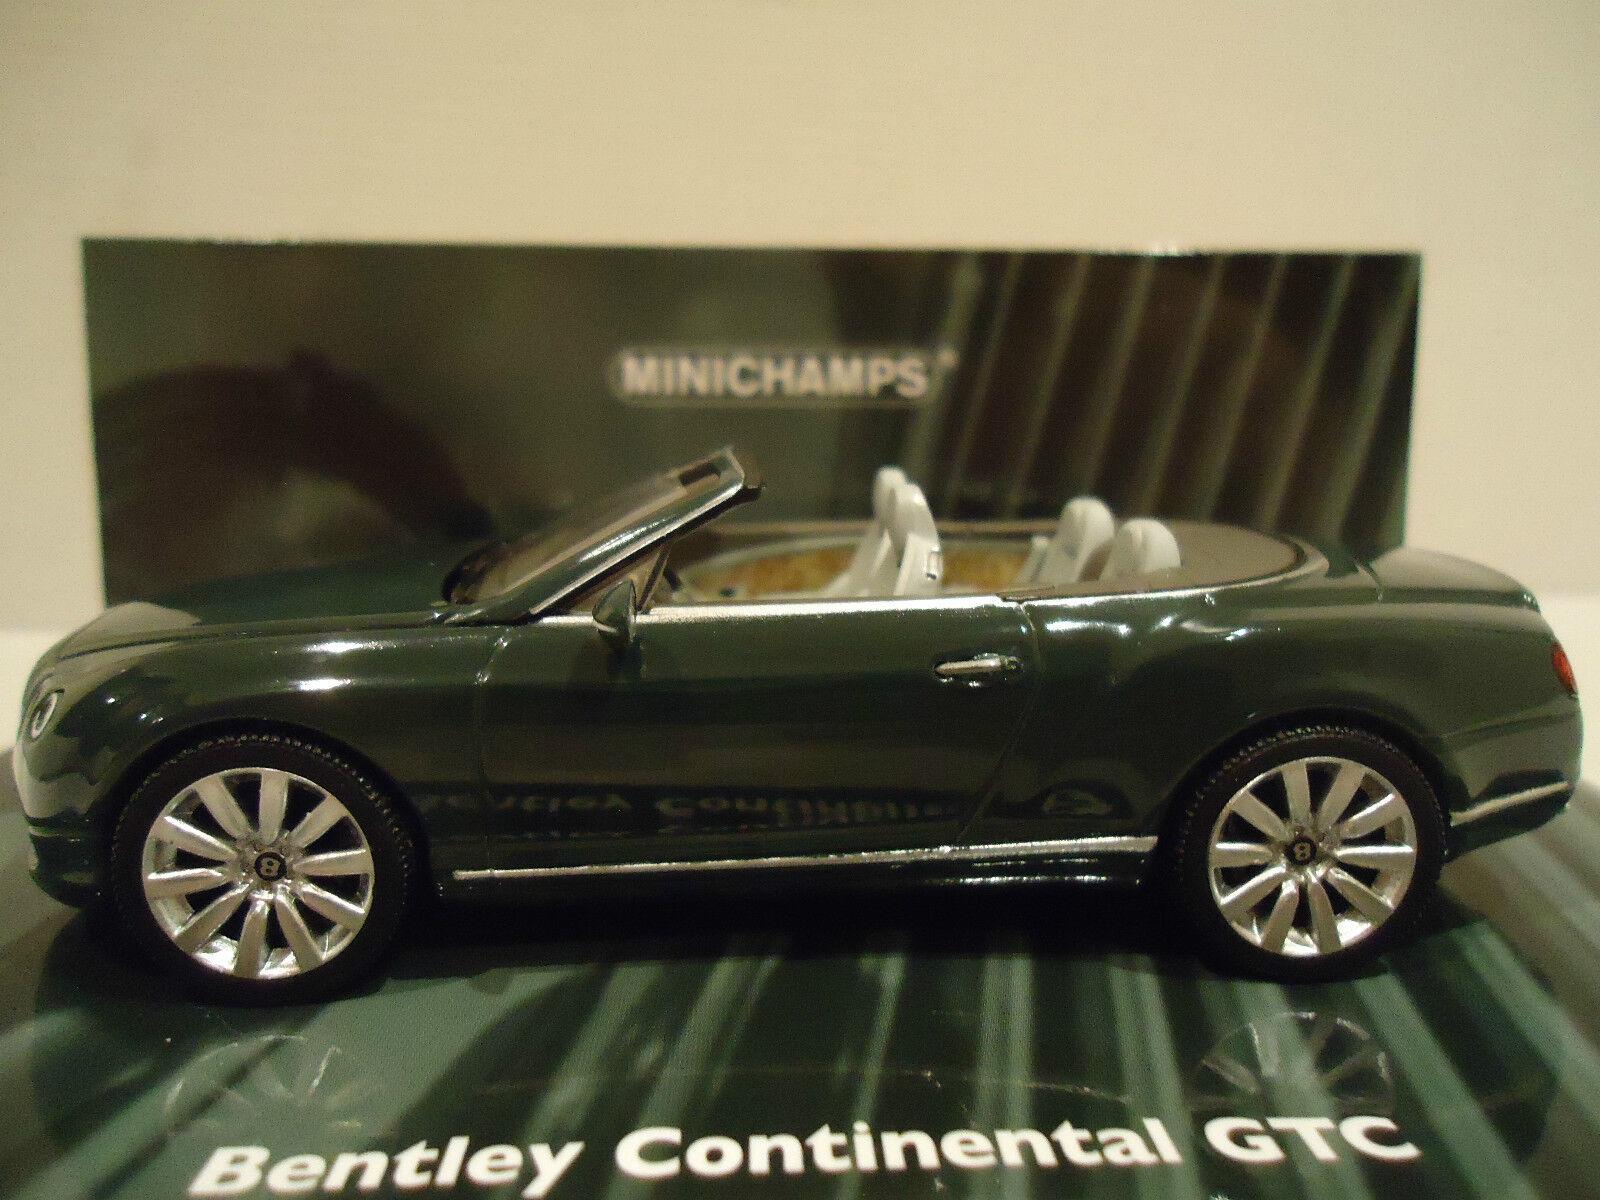 Minichamps  1 43  bentley continental    gtc  2011  green 57432b